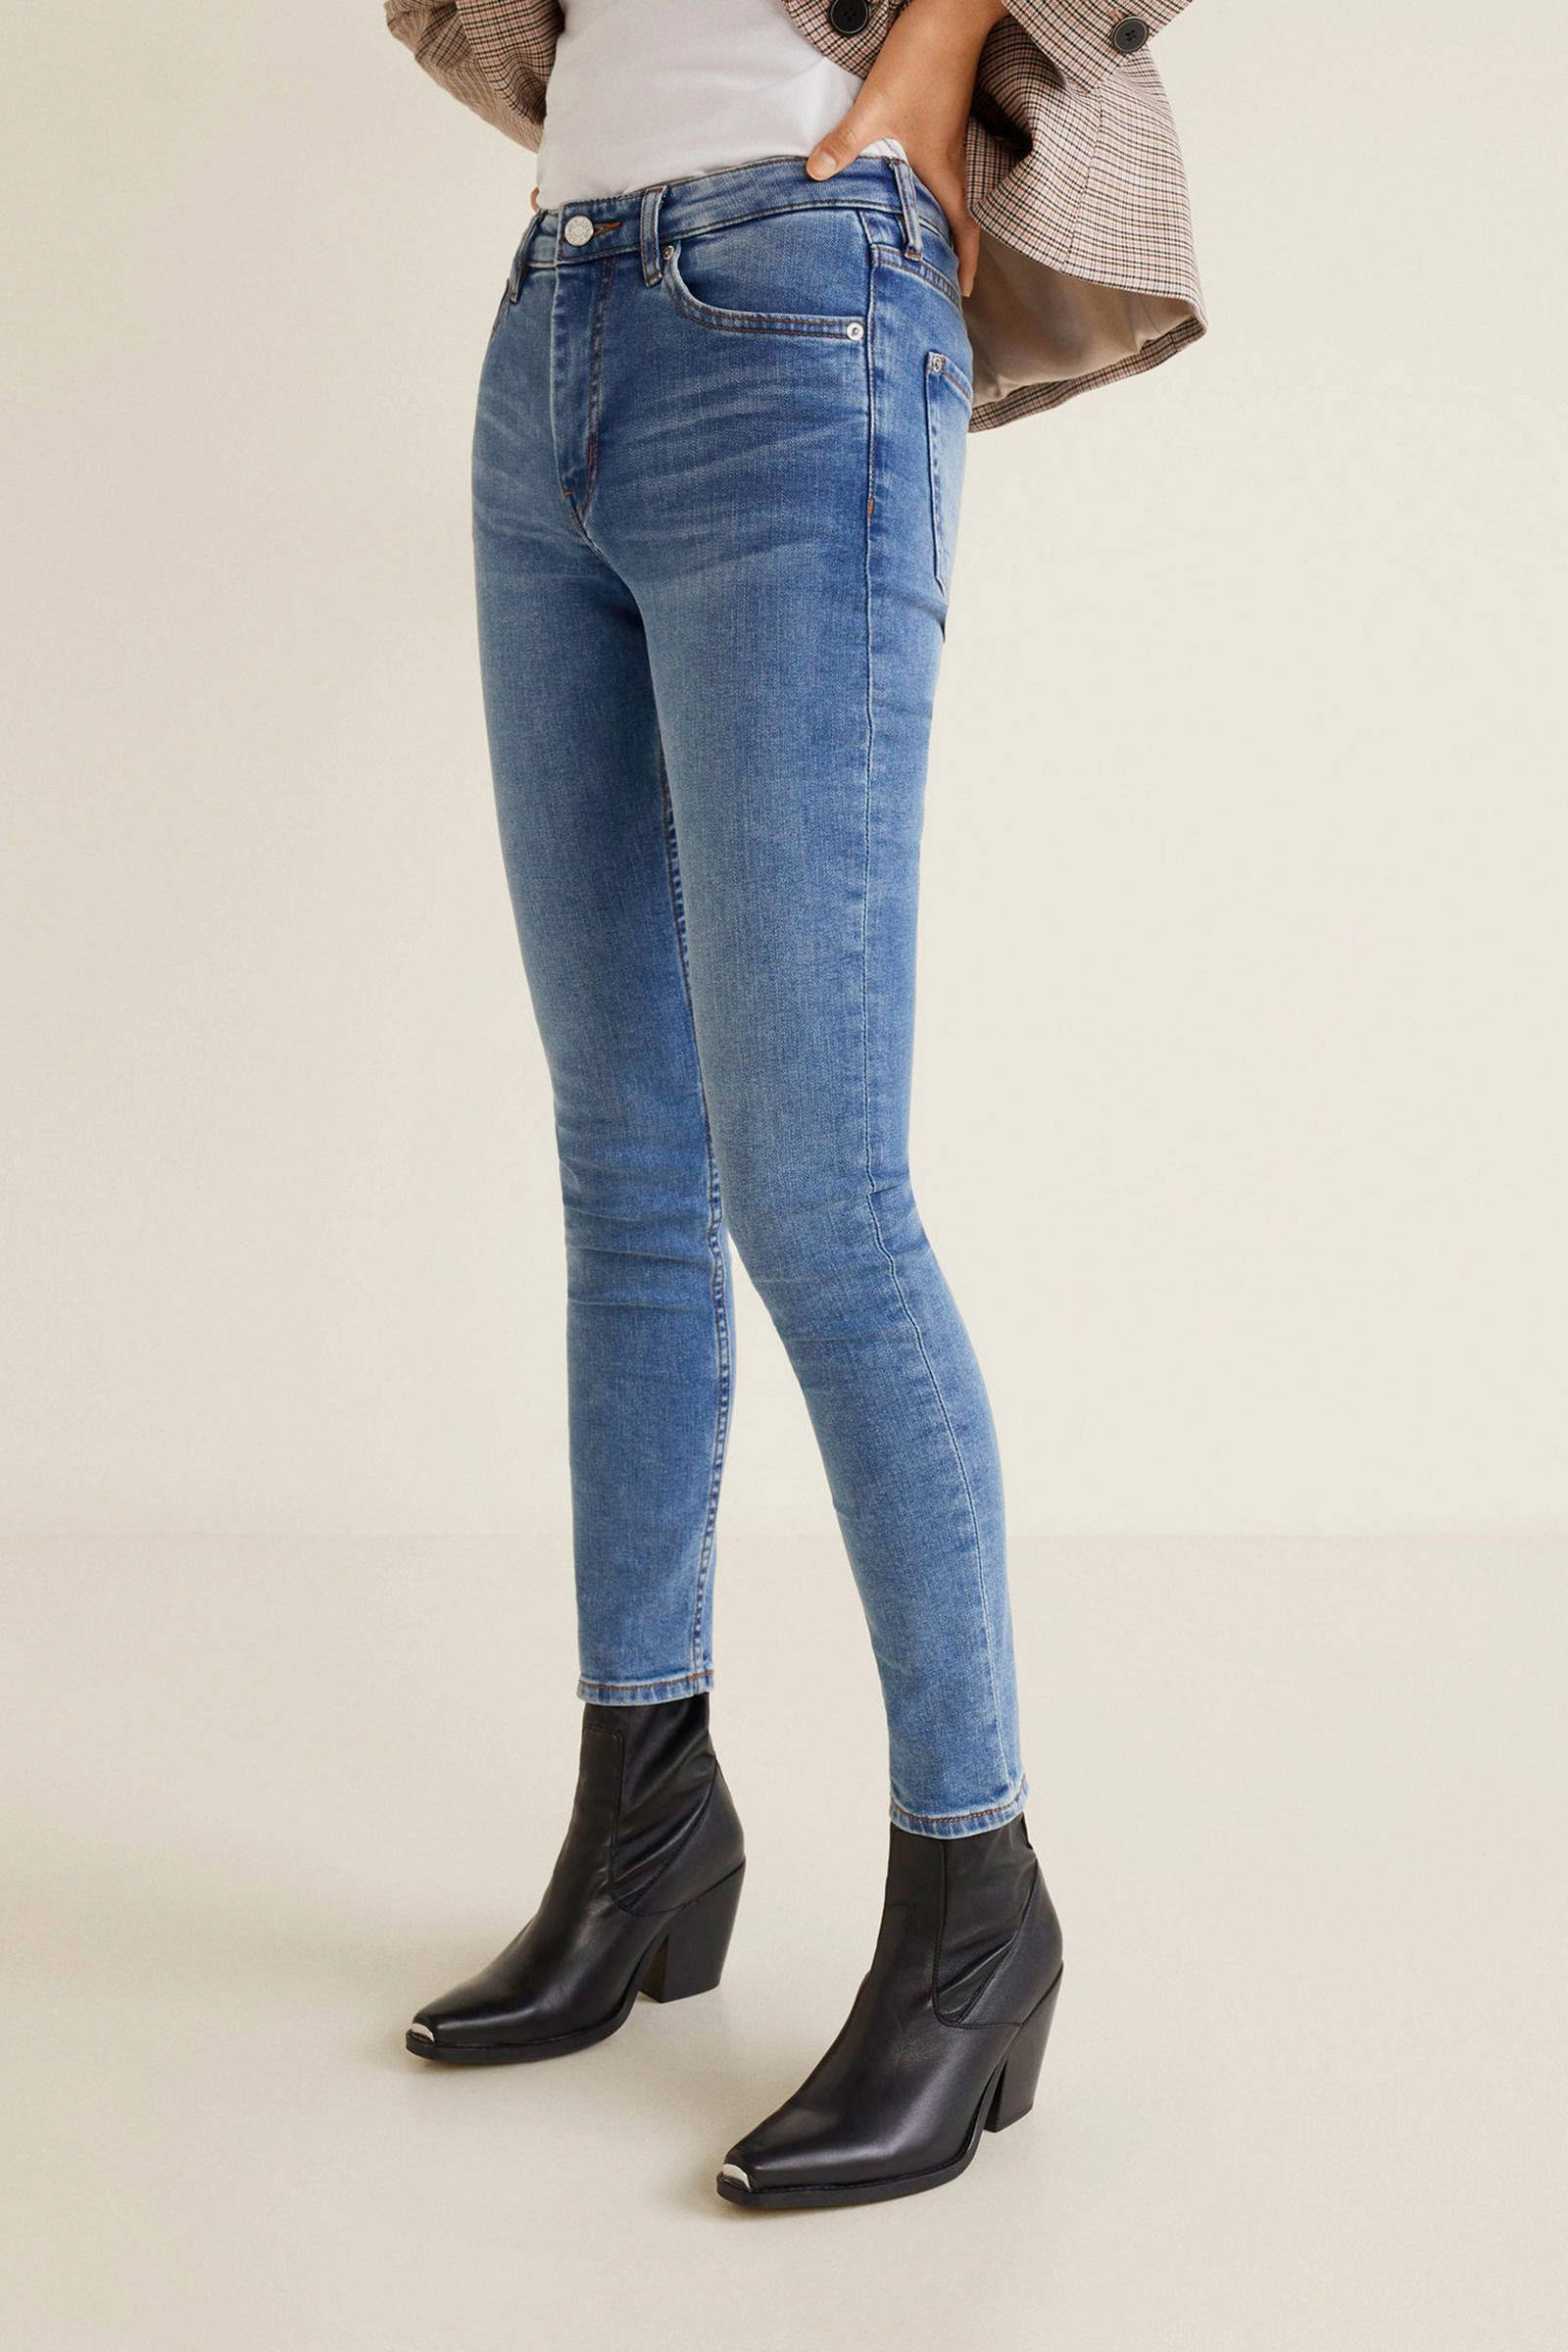 wassing 7 lichte Mango fit met jeans skinny 8 zwgxxaqU